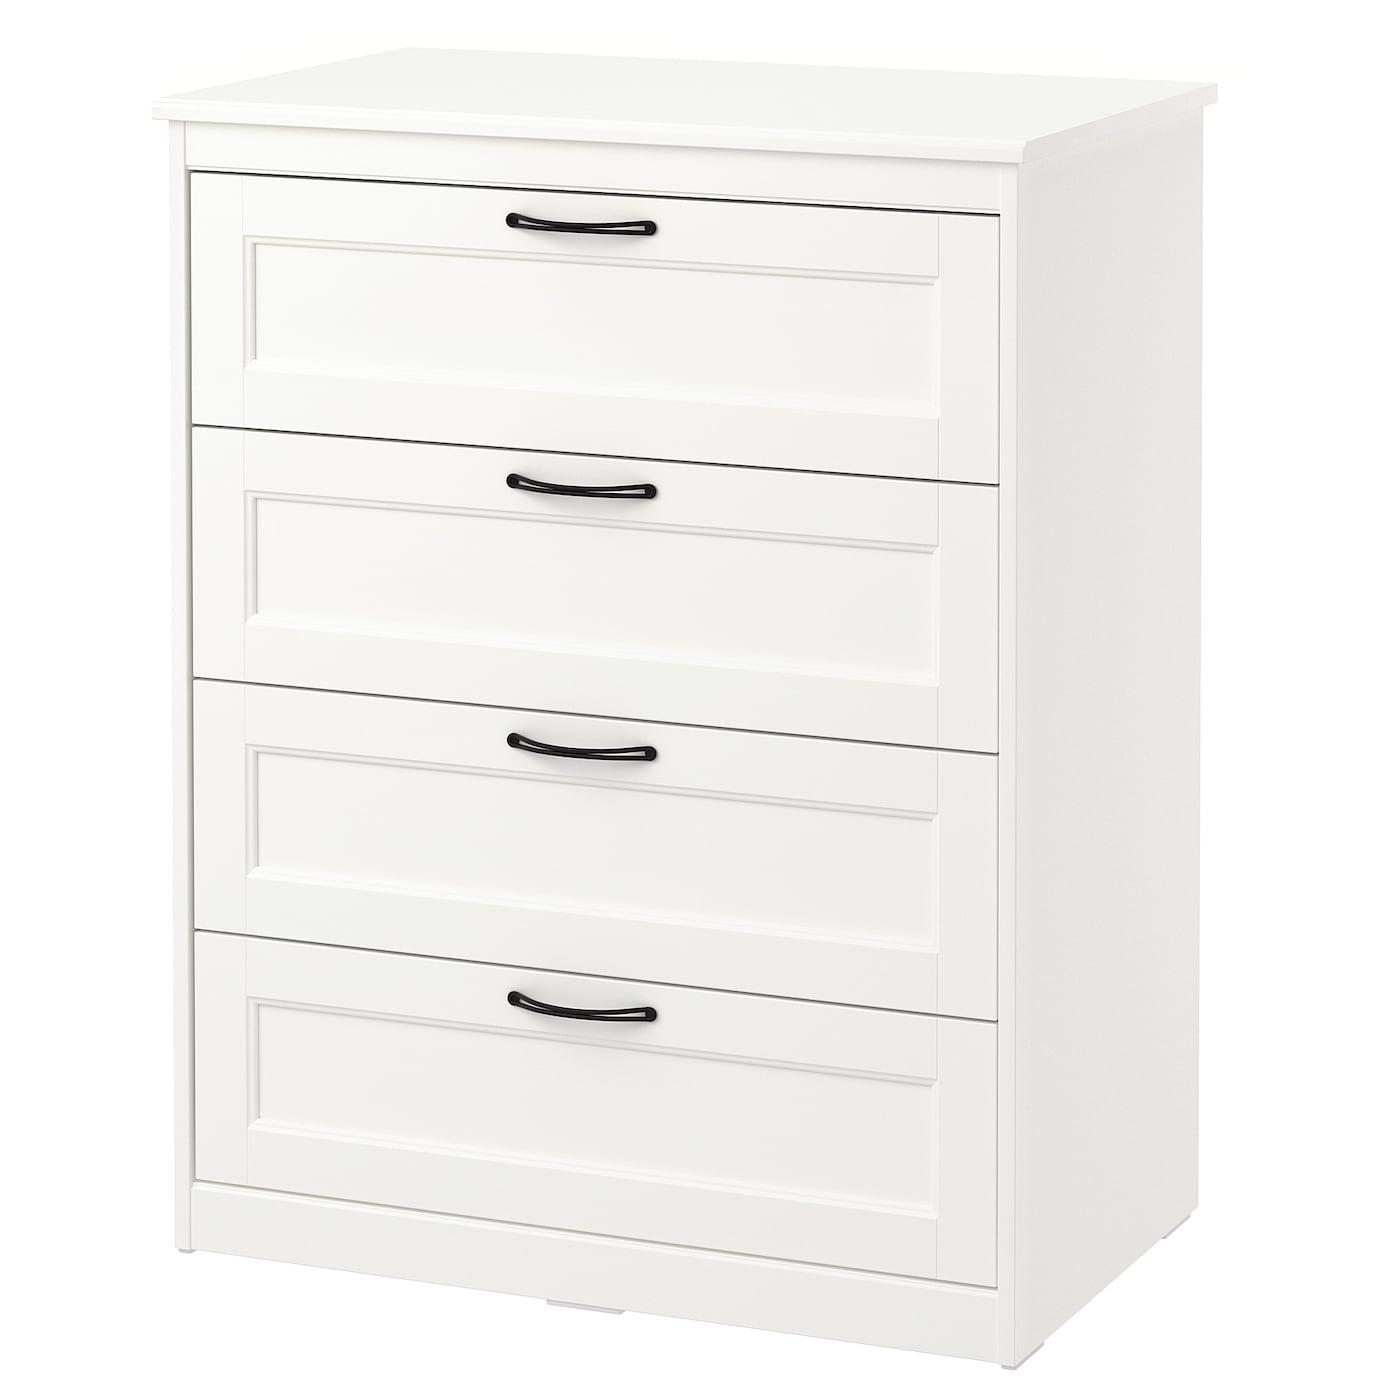 Songesand chest of 4 drawers white 82 x 104 cm ikea - Ikea mesillas y comodas ...